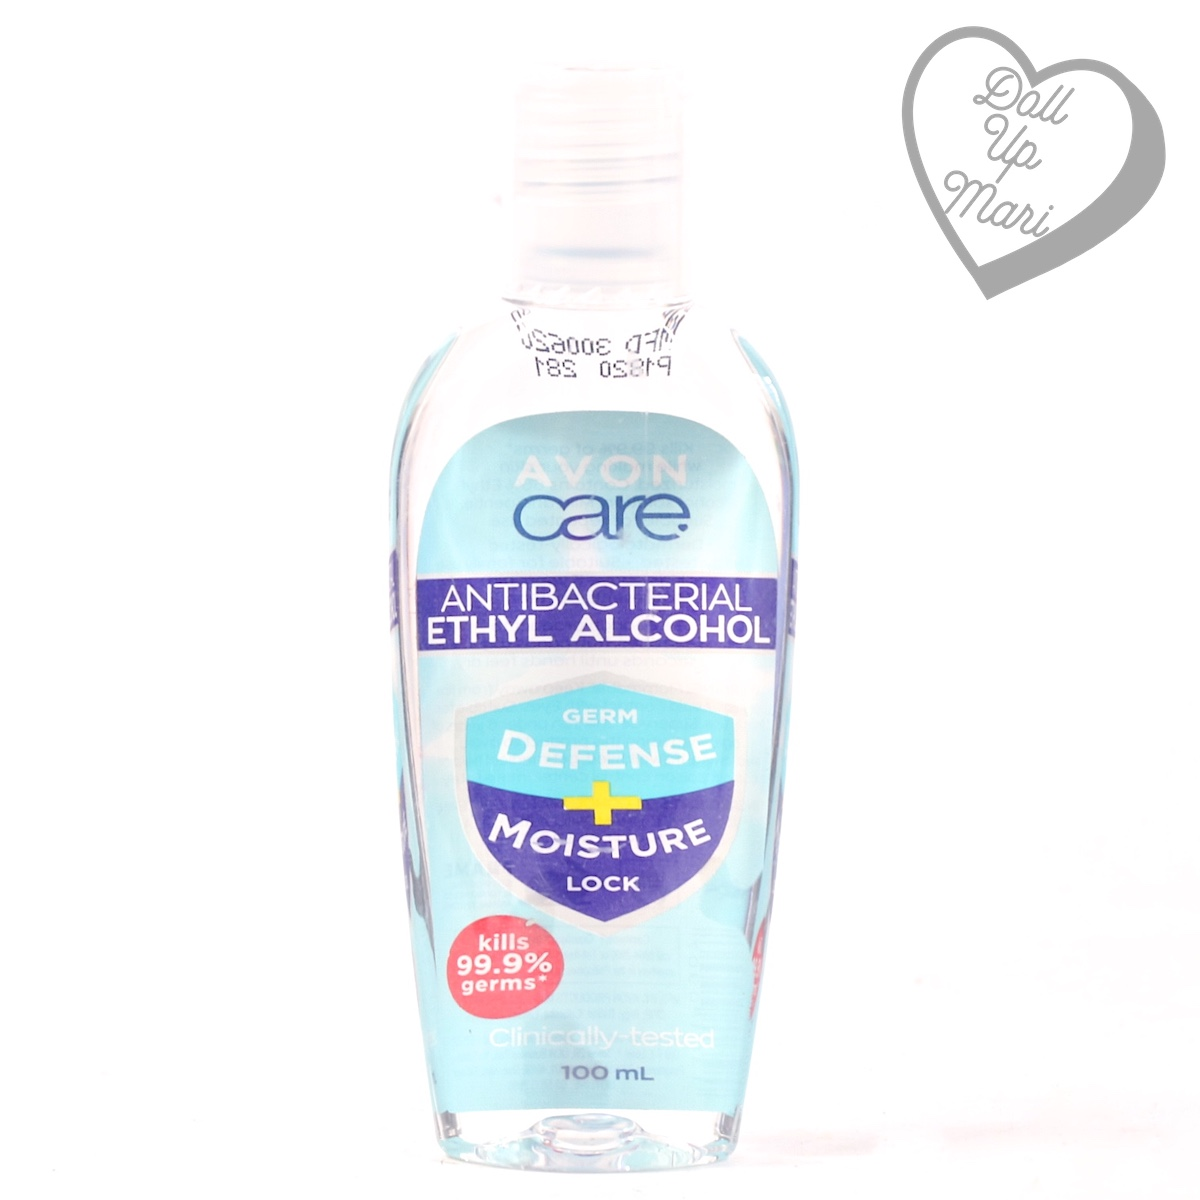 AVON Care Antibacterial Ethyl Alcohol